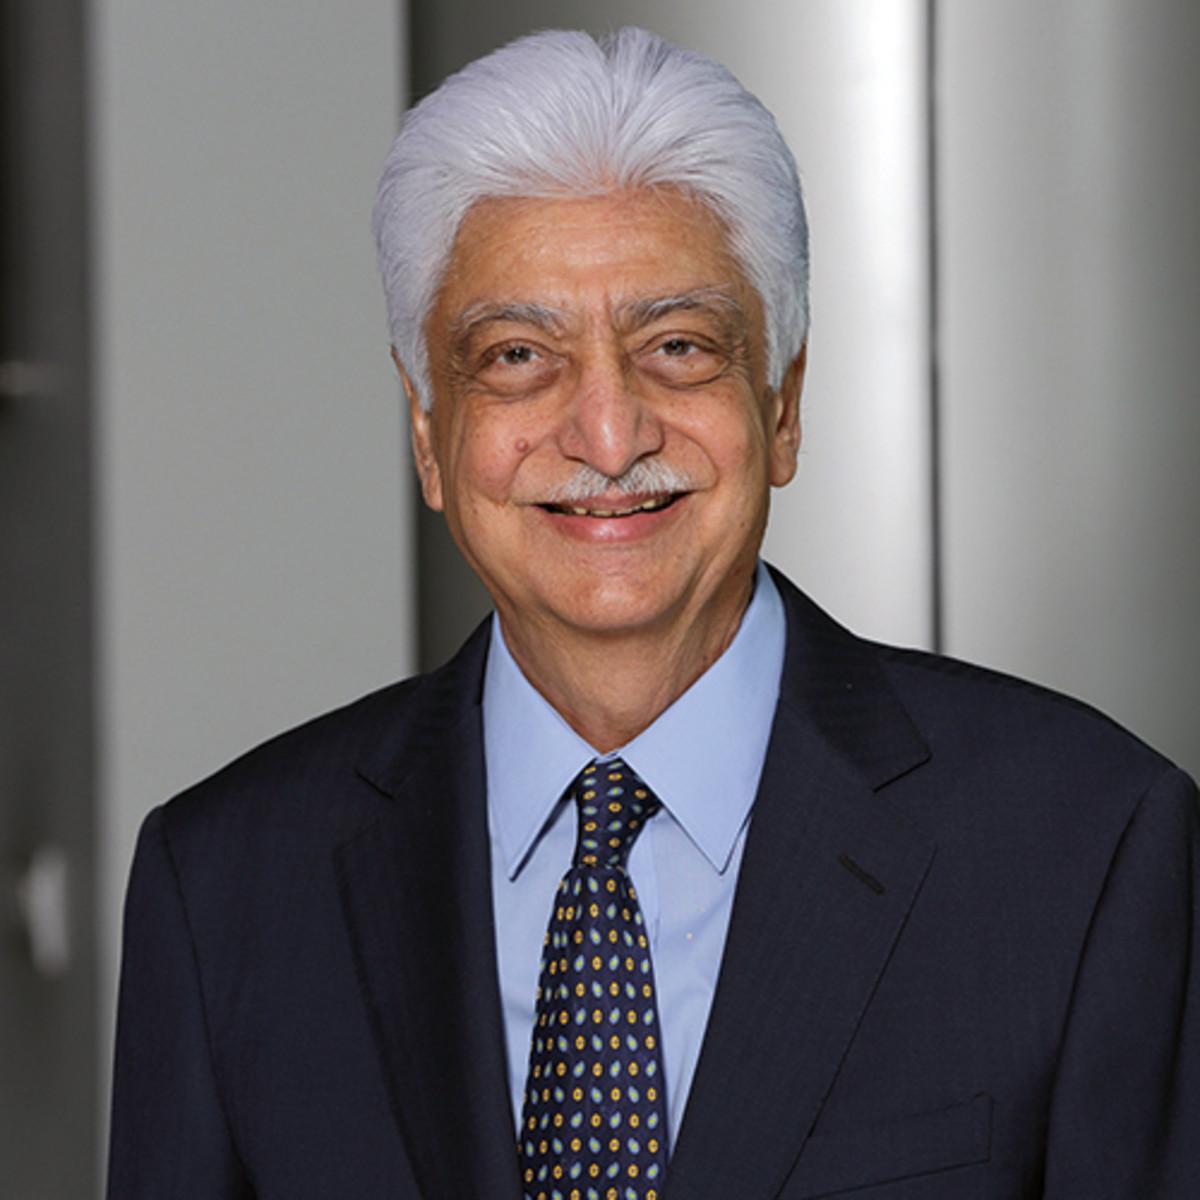 Azim Premji, Founder of Wipro